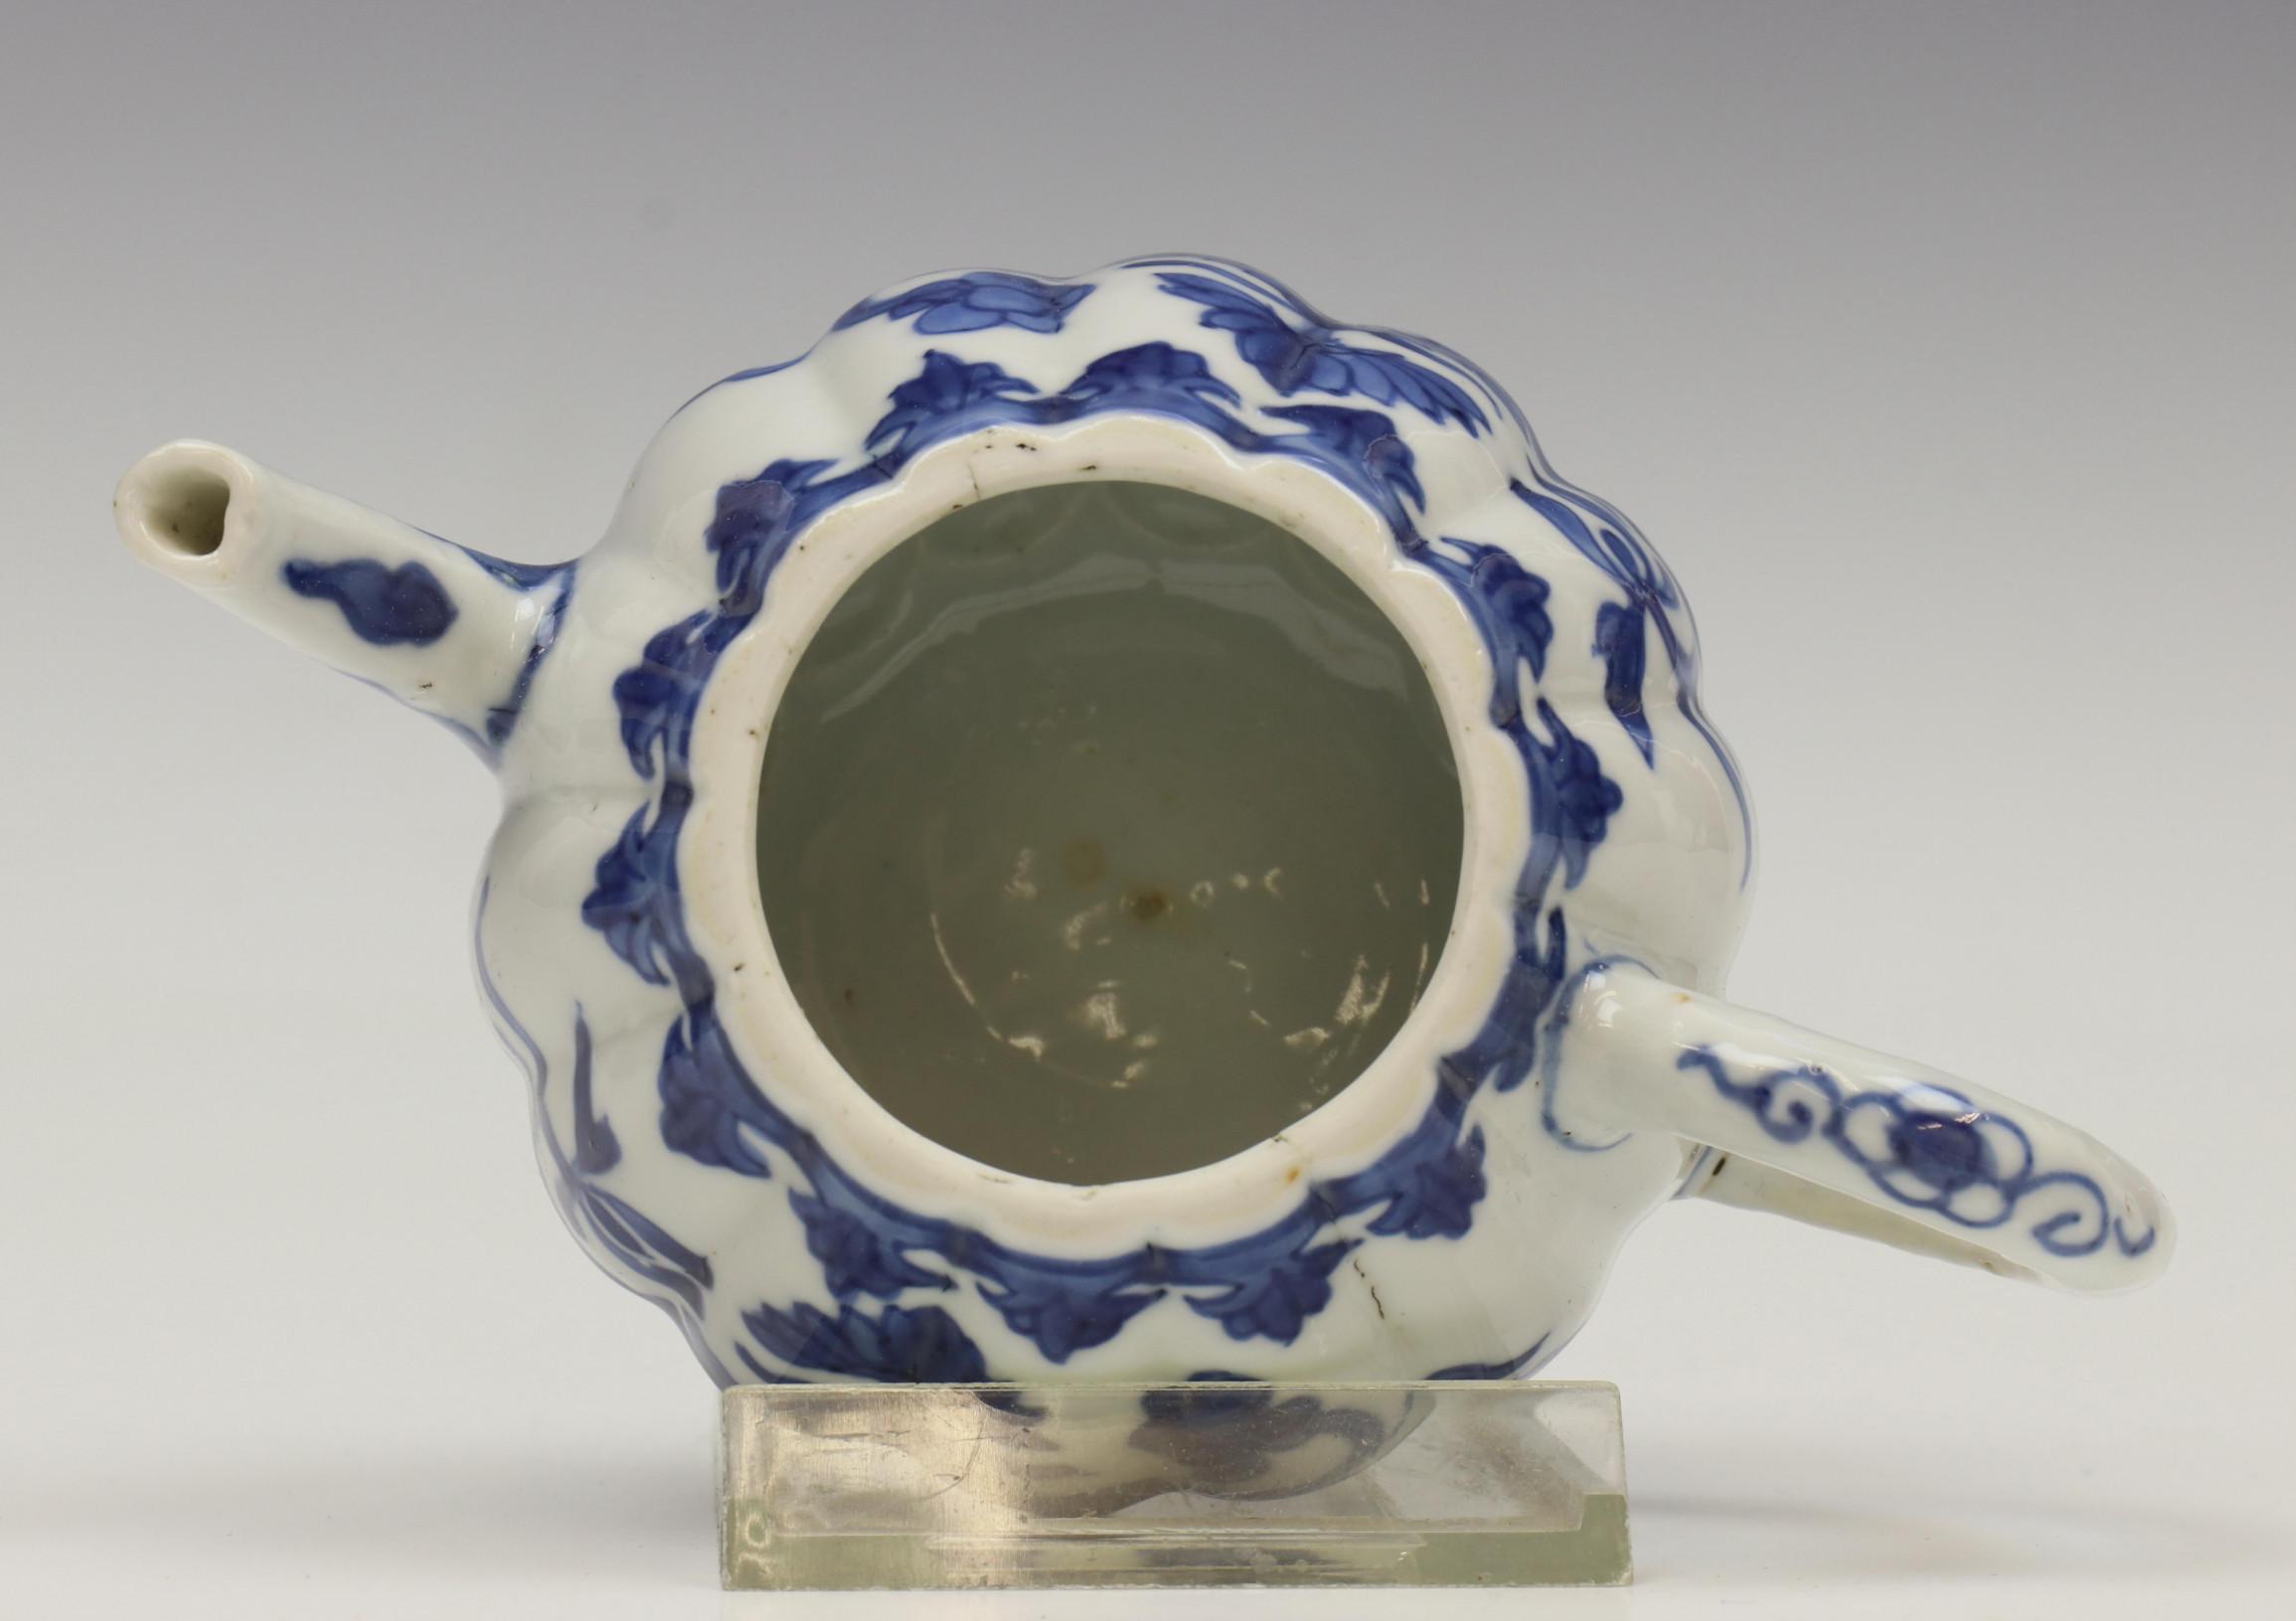 China, blauw-wit porseleinen gelobd trekpotje, Kangxi, - Image 4 of 6